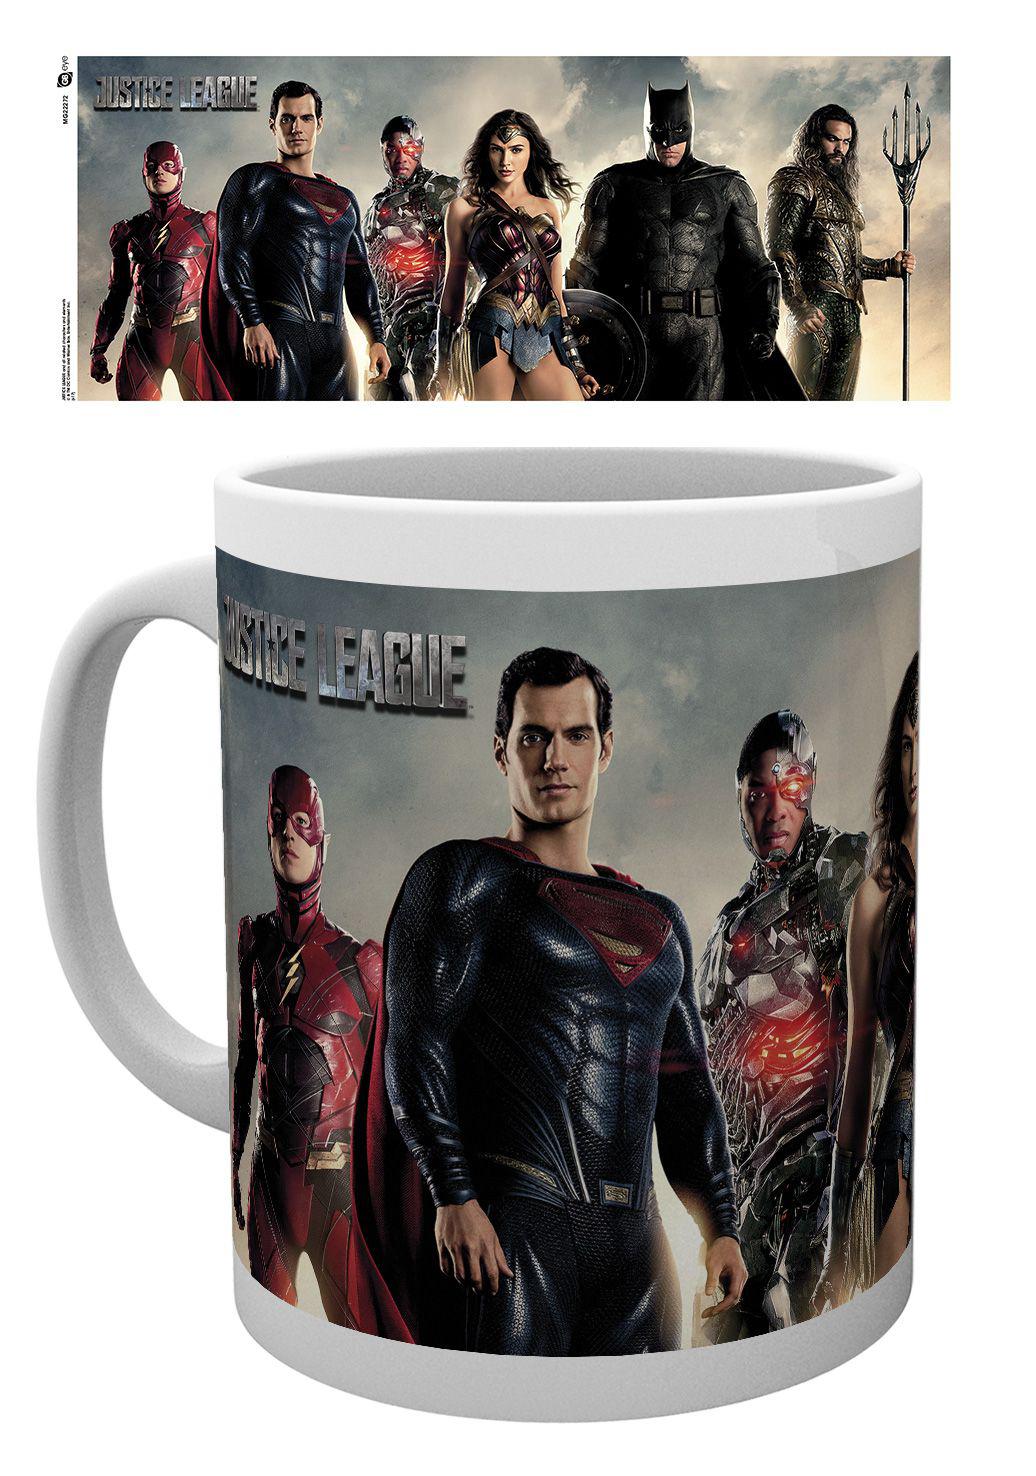 Offiziell Dc Comics Justice League Wonder Woman Film Aktion Kaffee Tasse